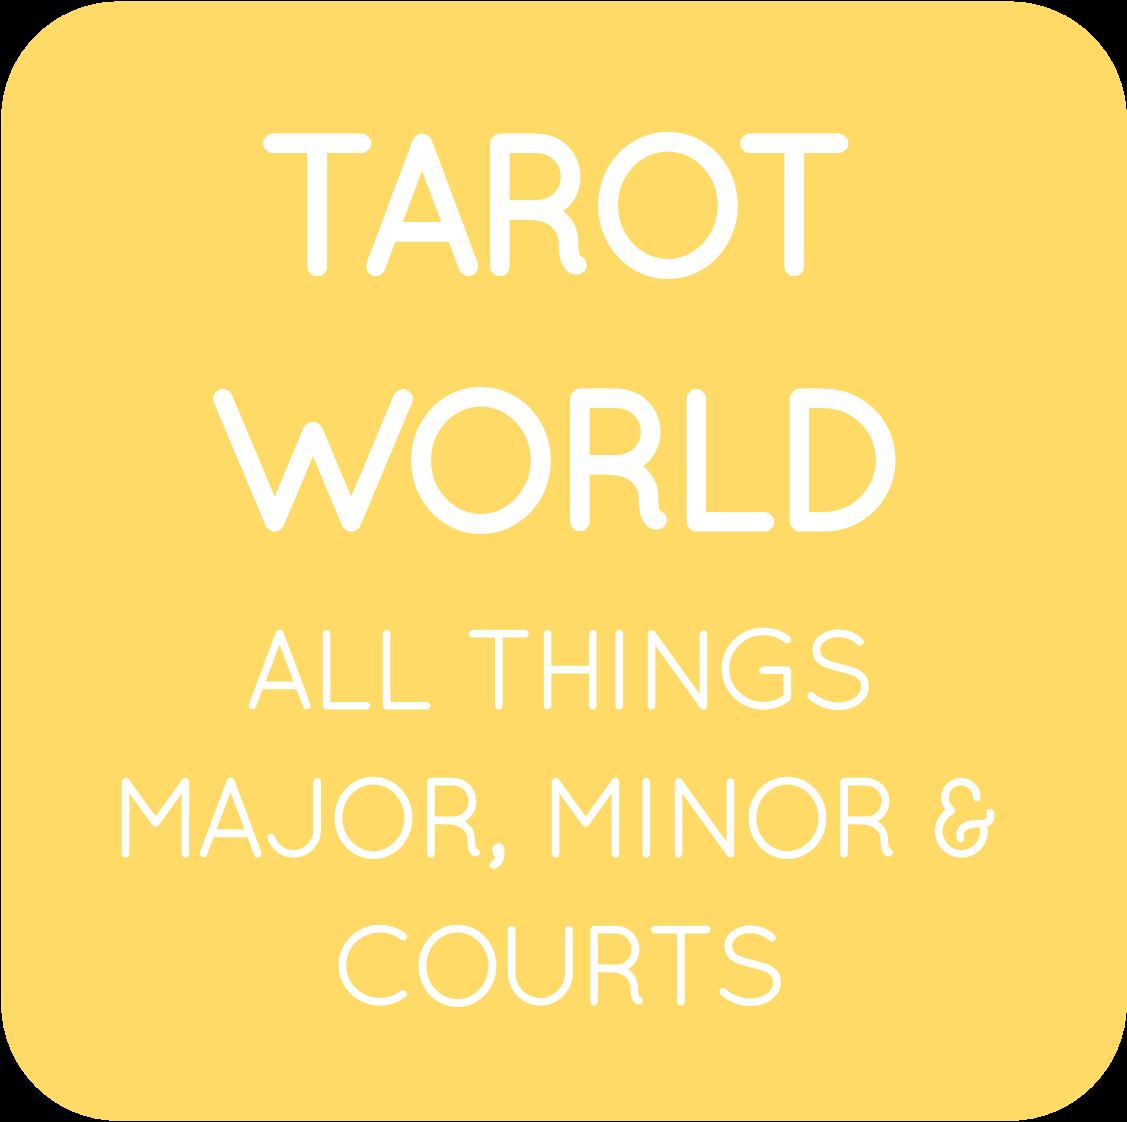 00-TAROT WORLD.png